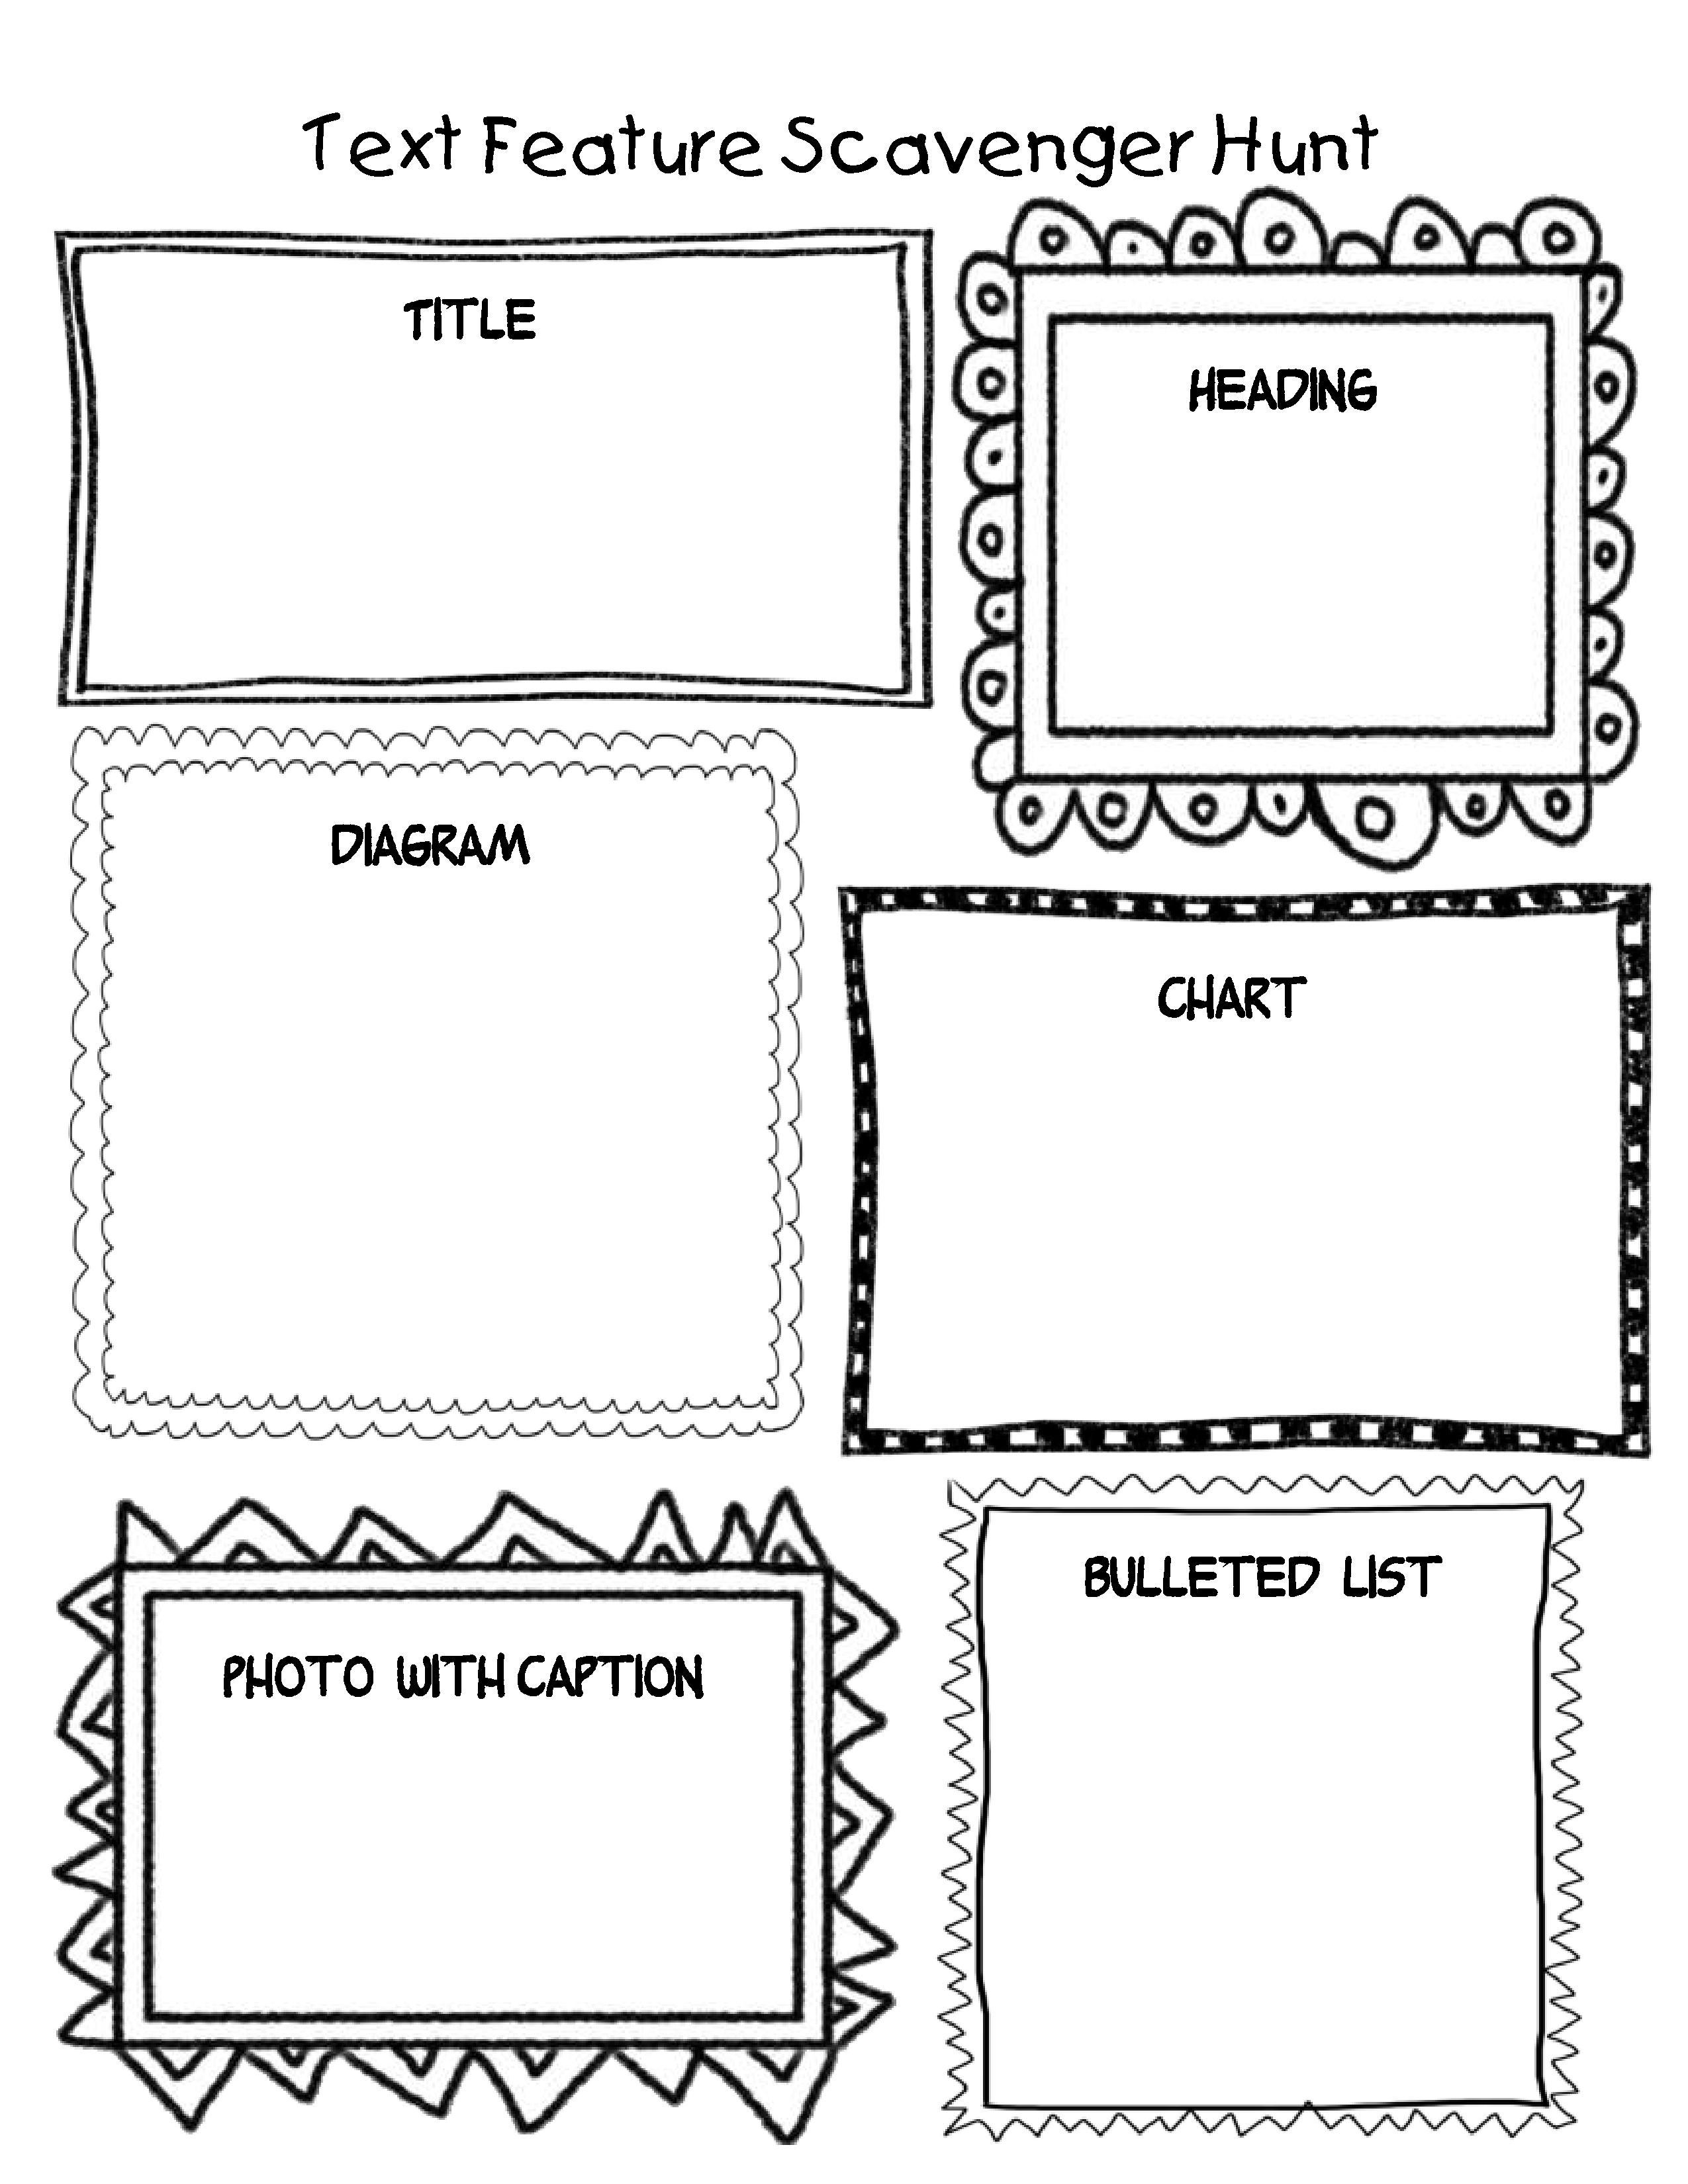 worksheet Elements Of Story Worksheet story elements worksheets 3rd grade free library st y w ksheets gr de libr ry